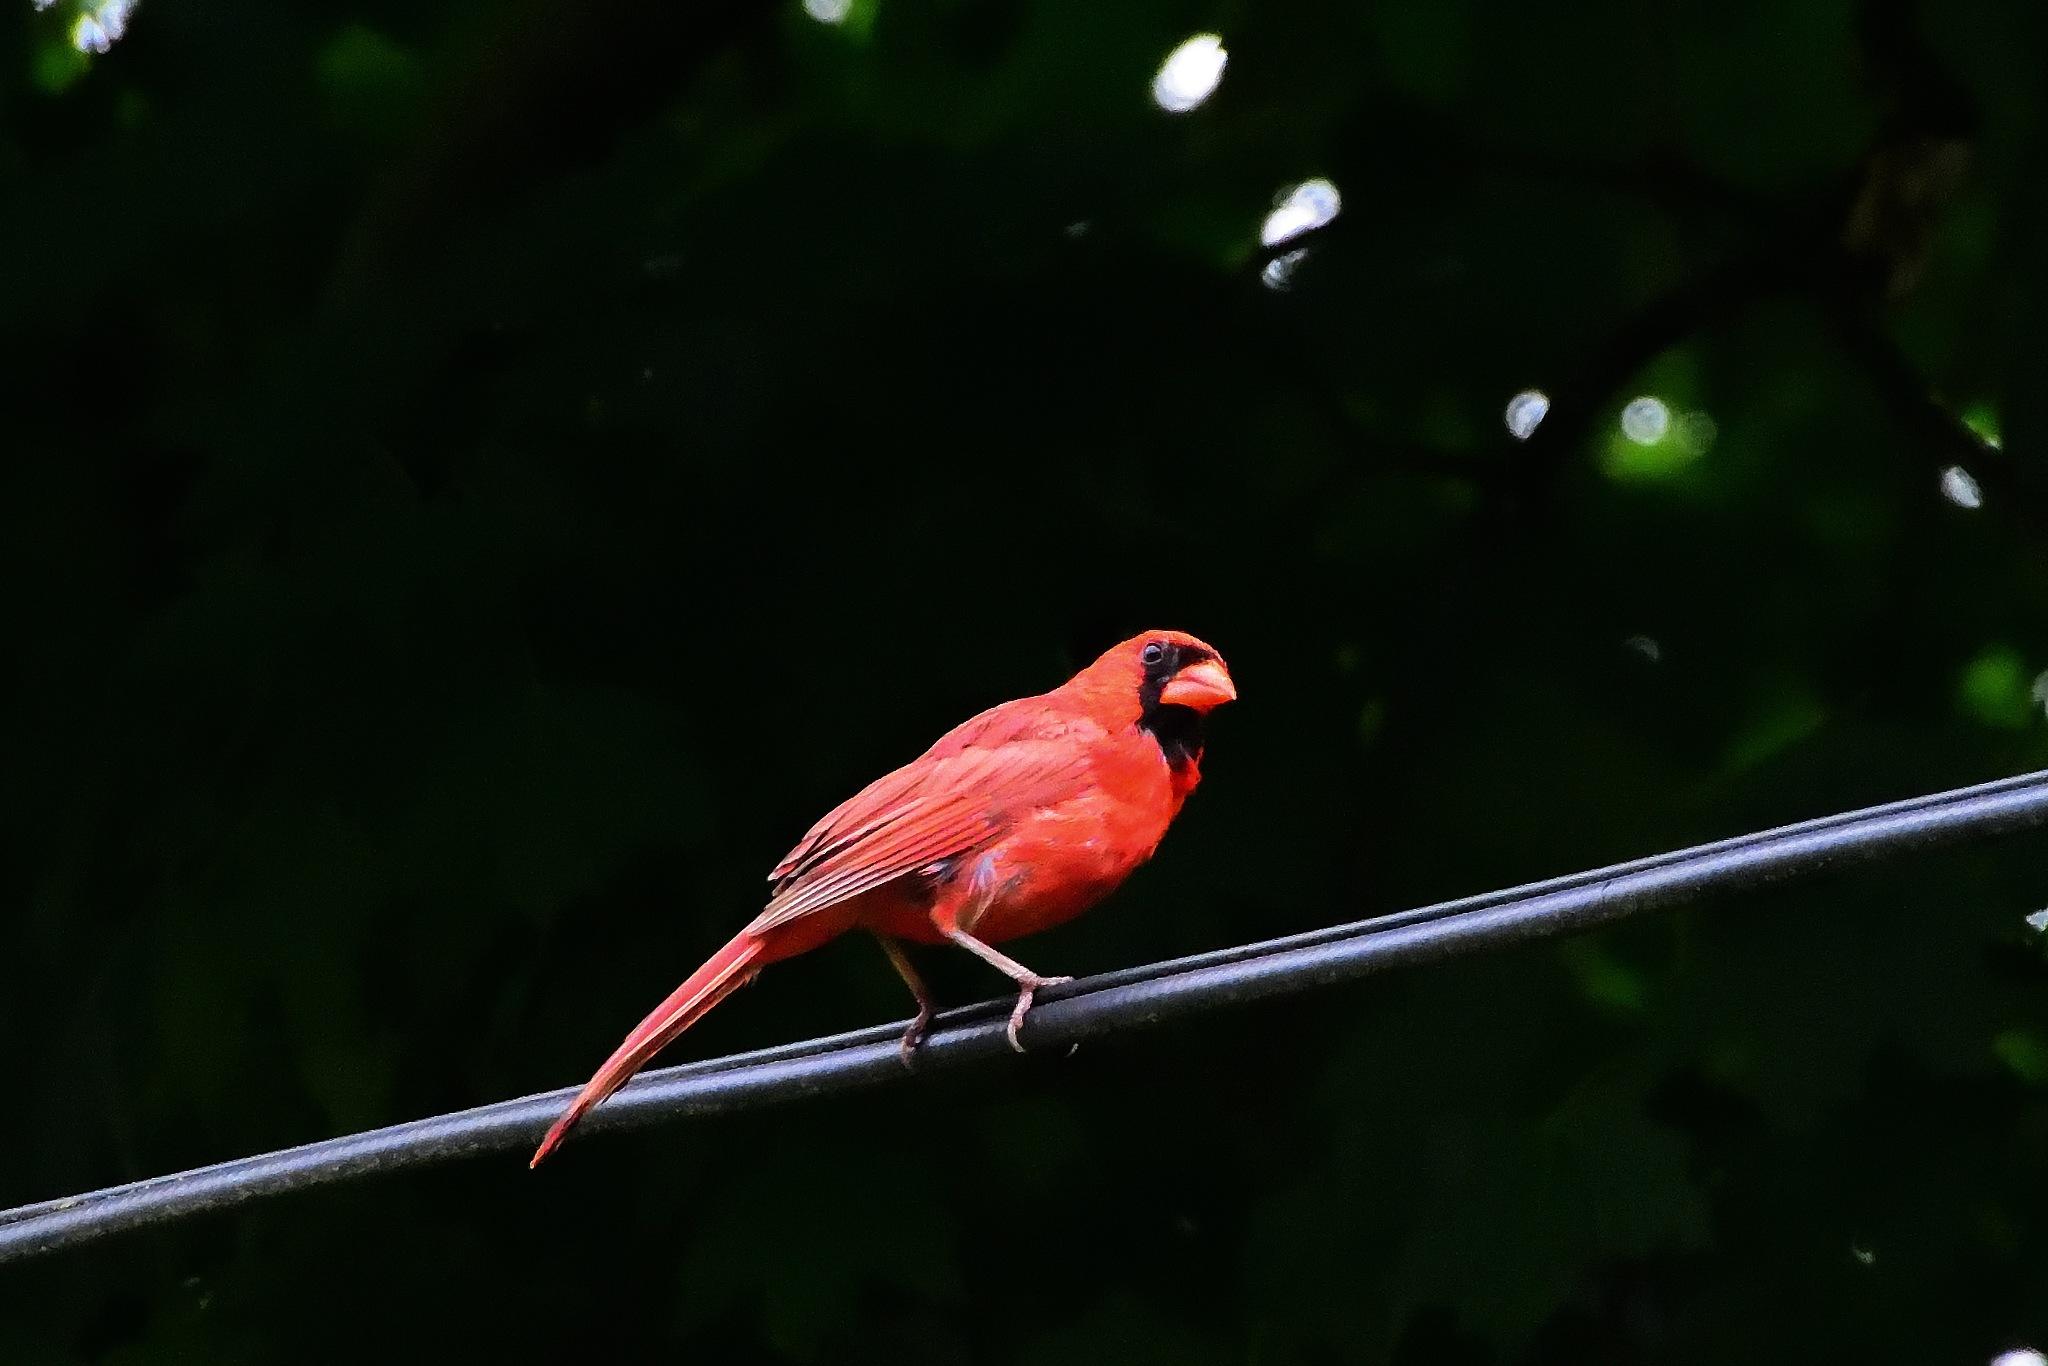 Bird on a Wire by Greg Knott